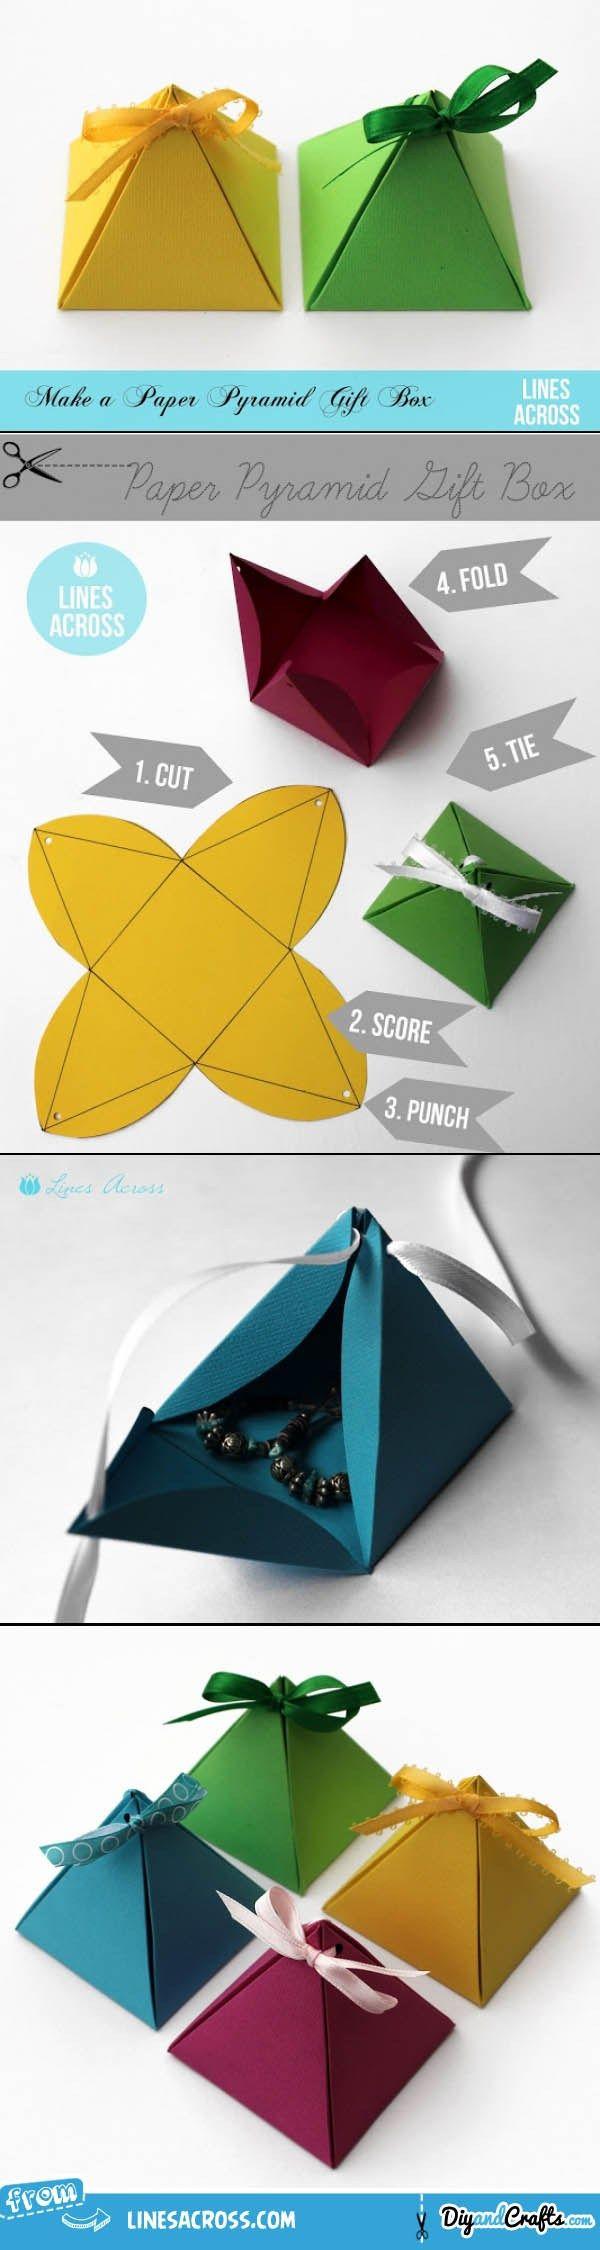 Paper Pyramid Gift Boxes | #DIY